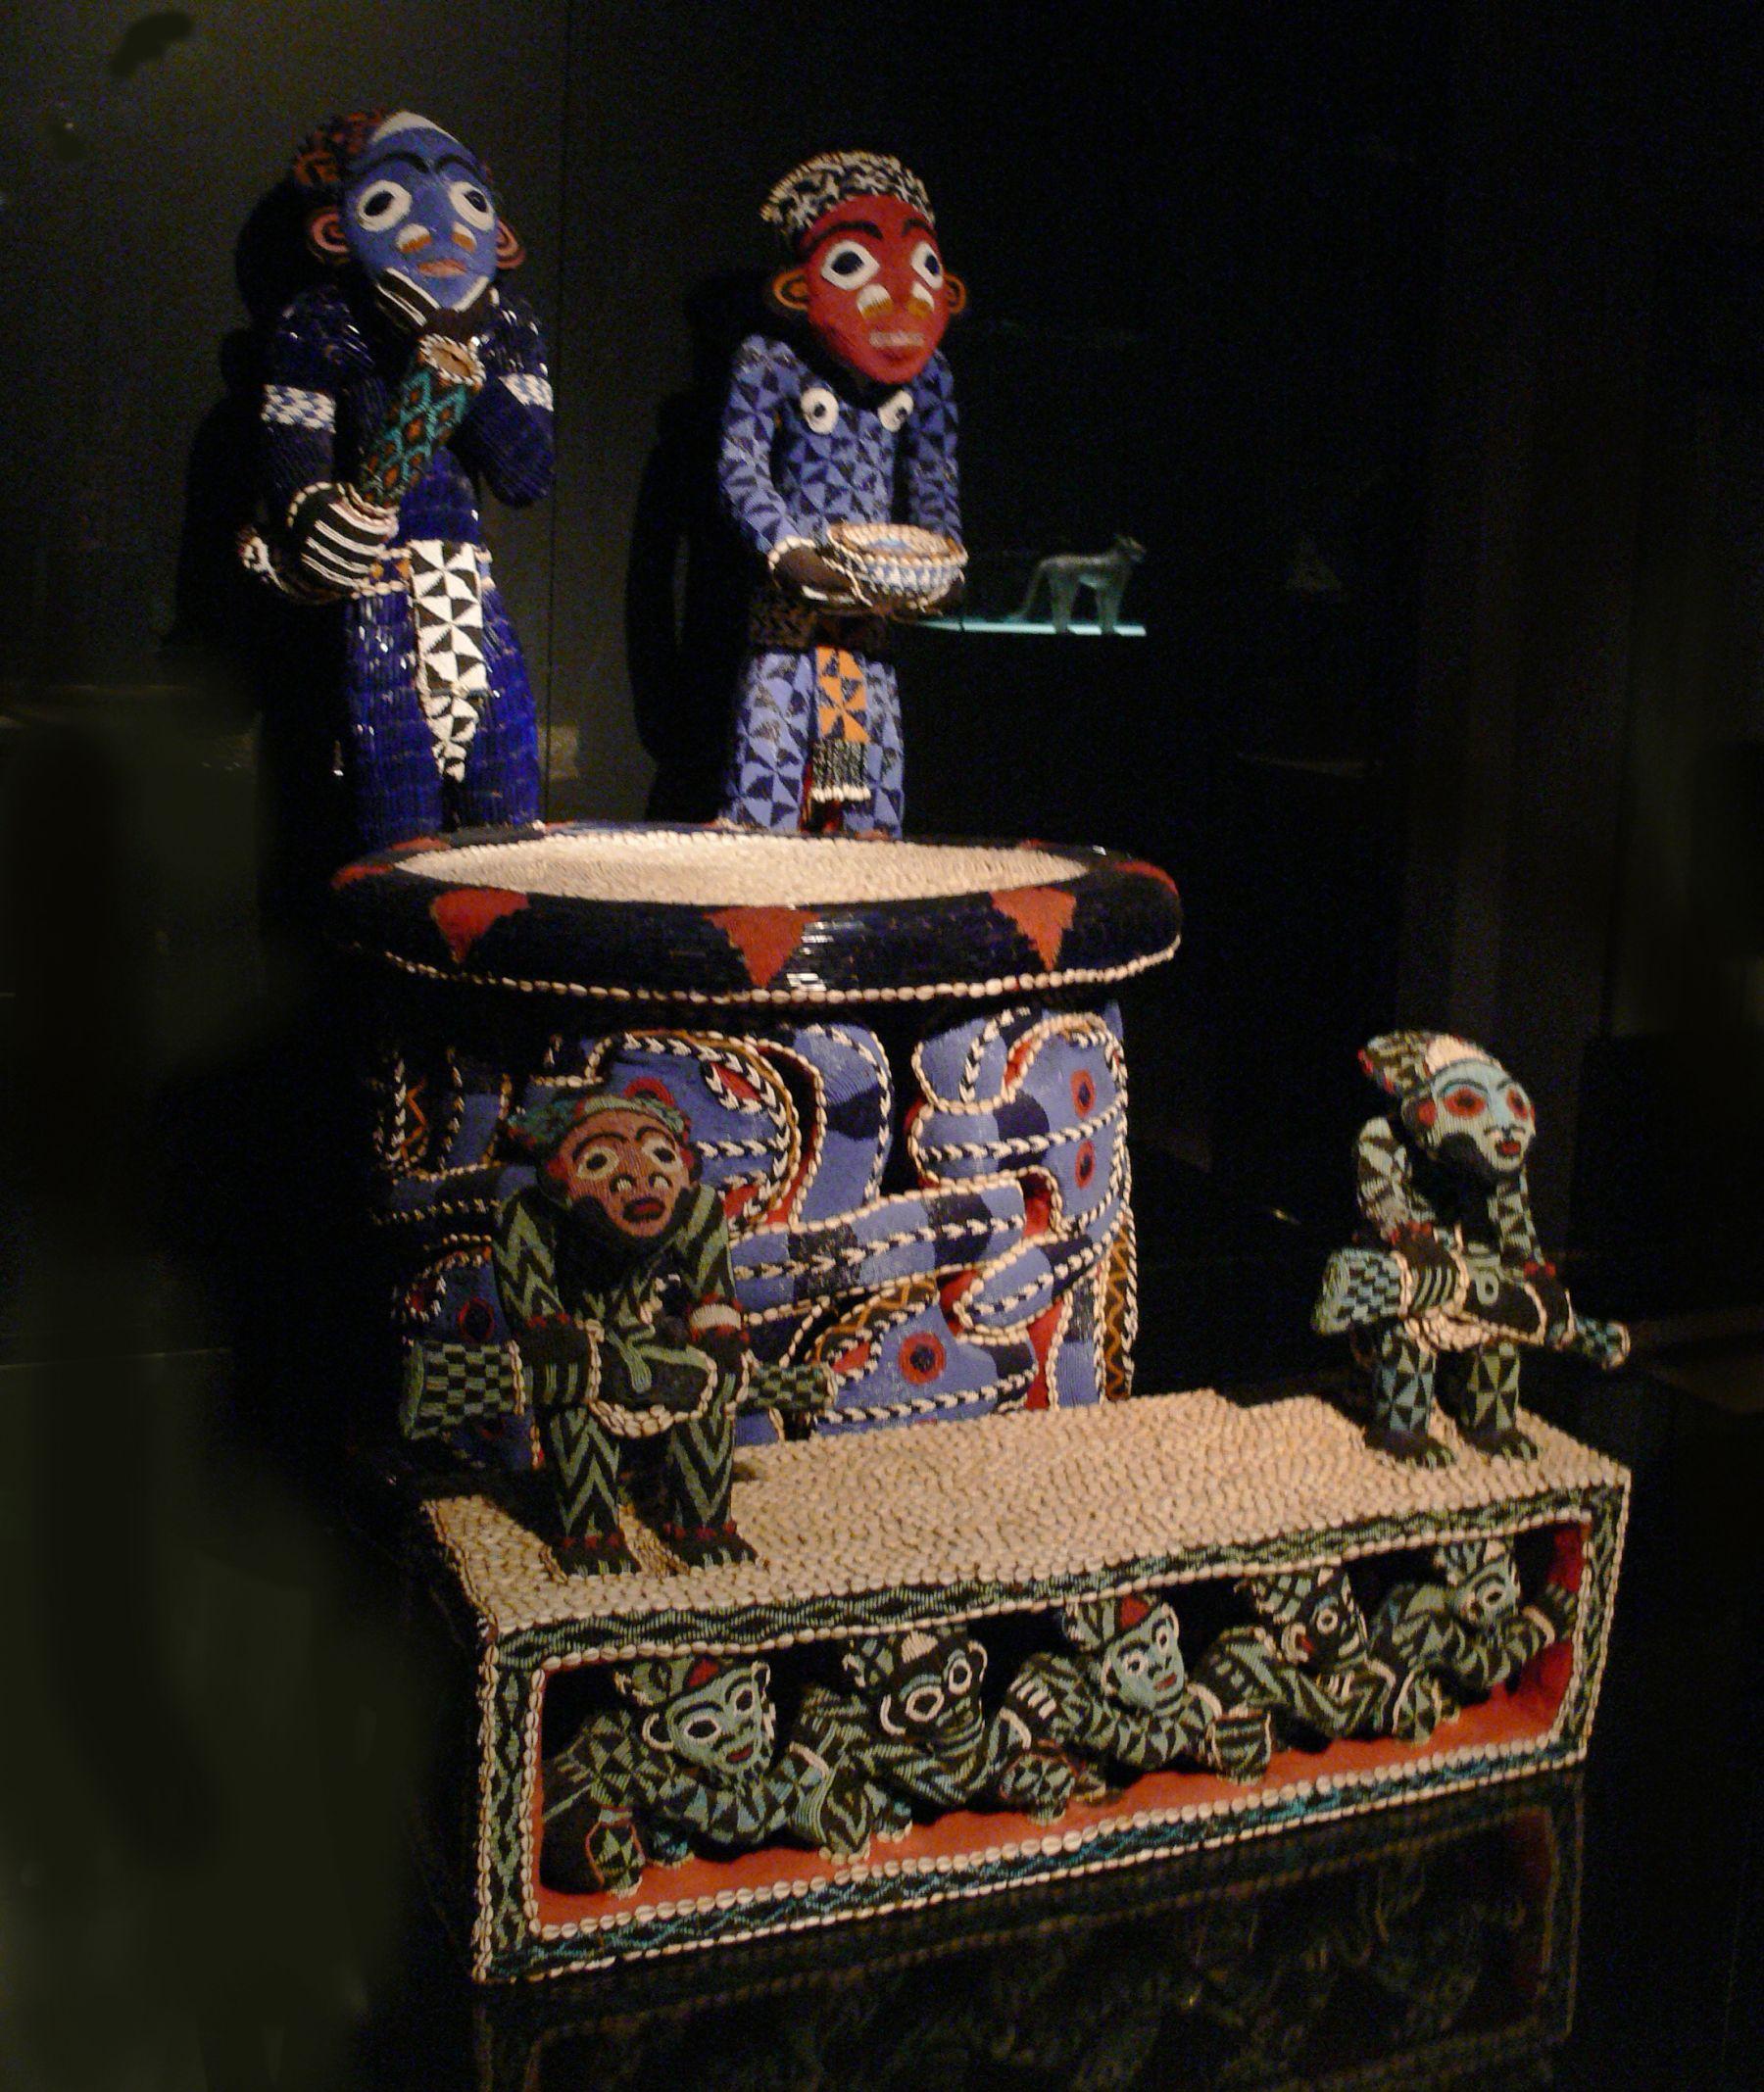 Umetnost naroda Afrike 54518